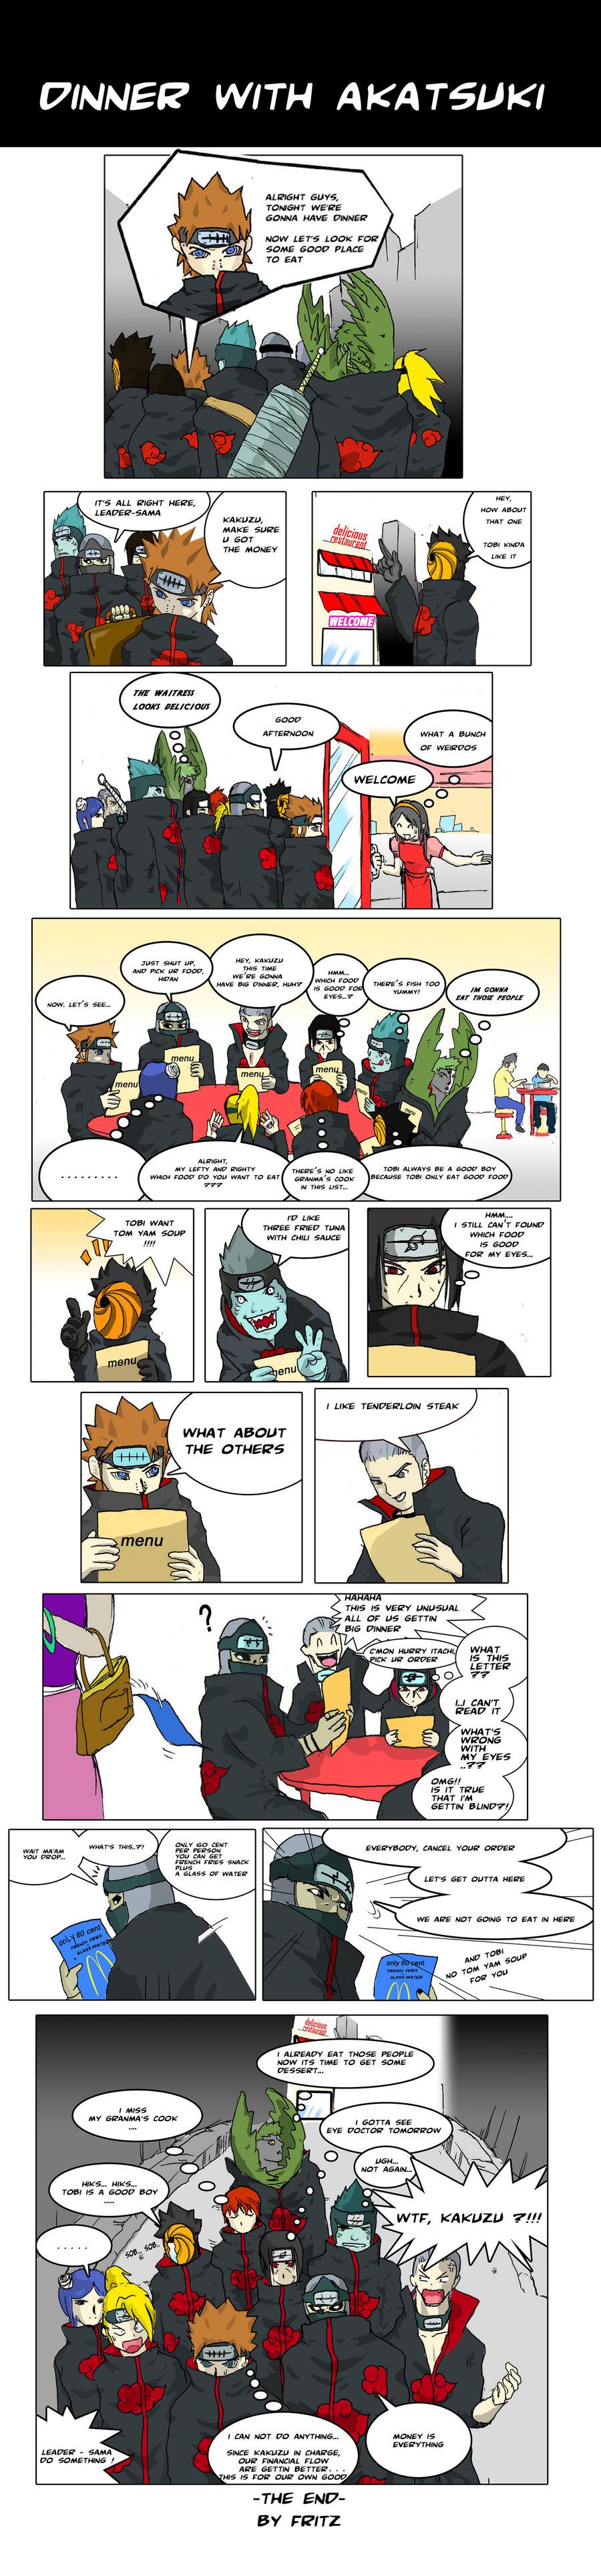 Funny Akatsuki Comics #21